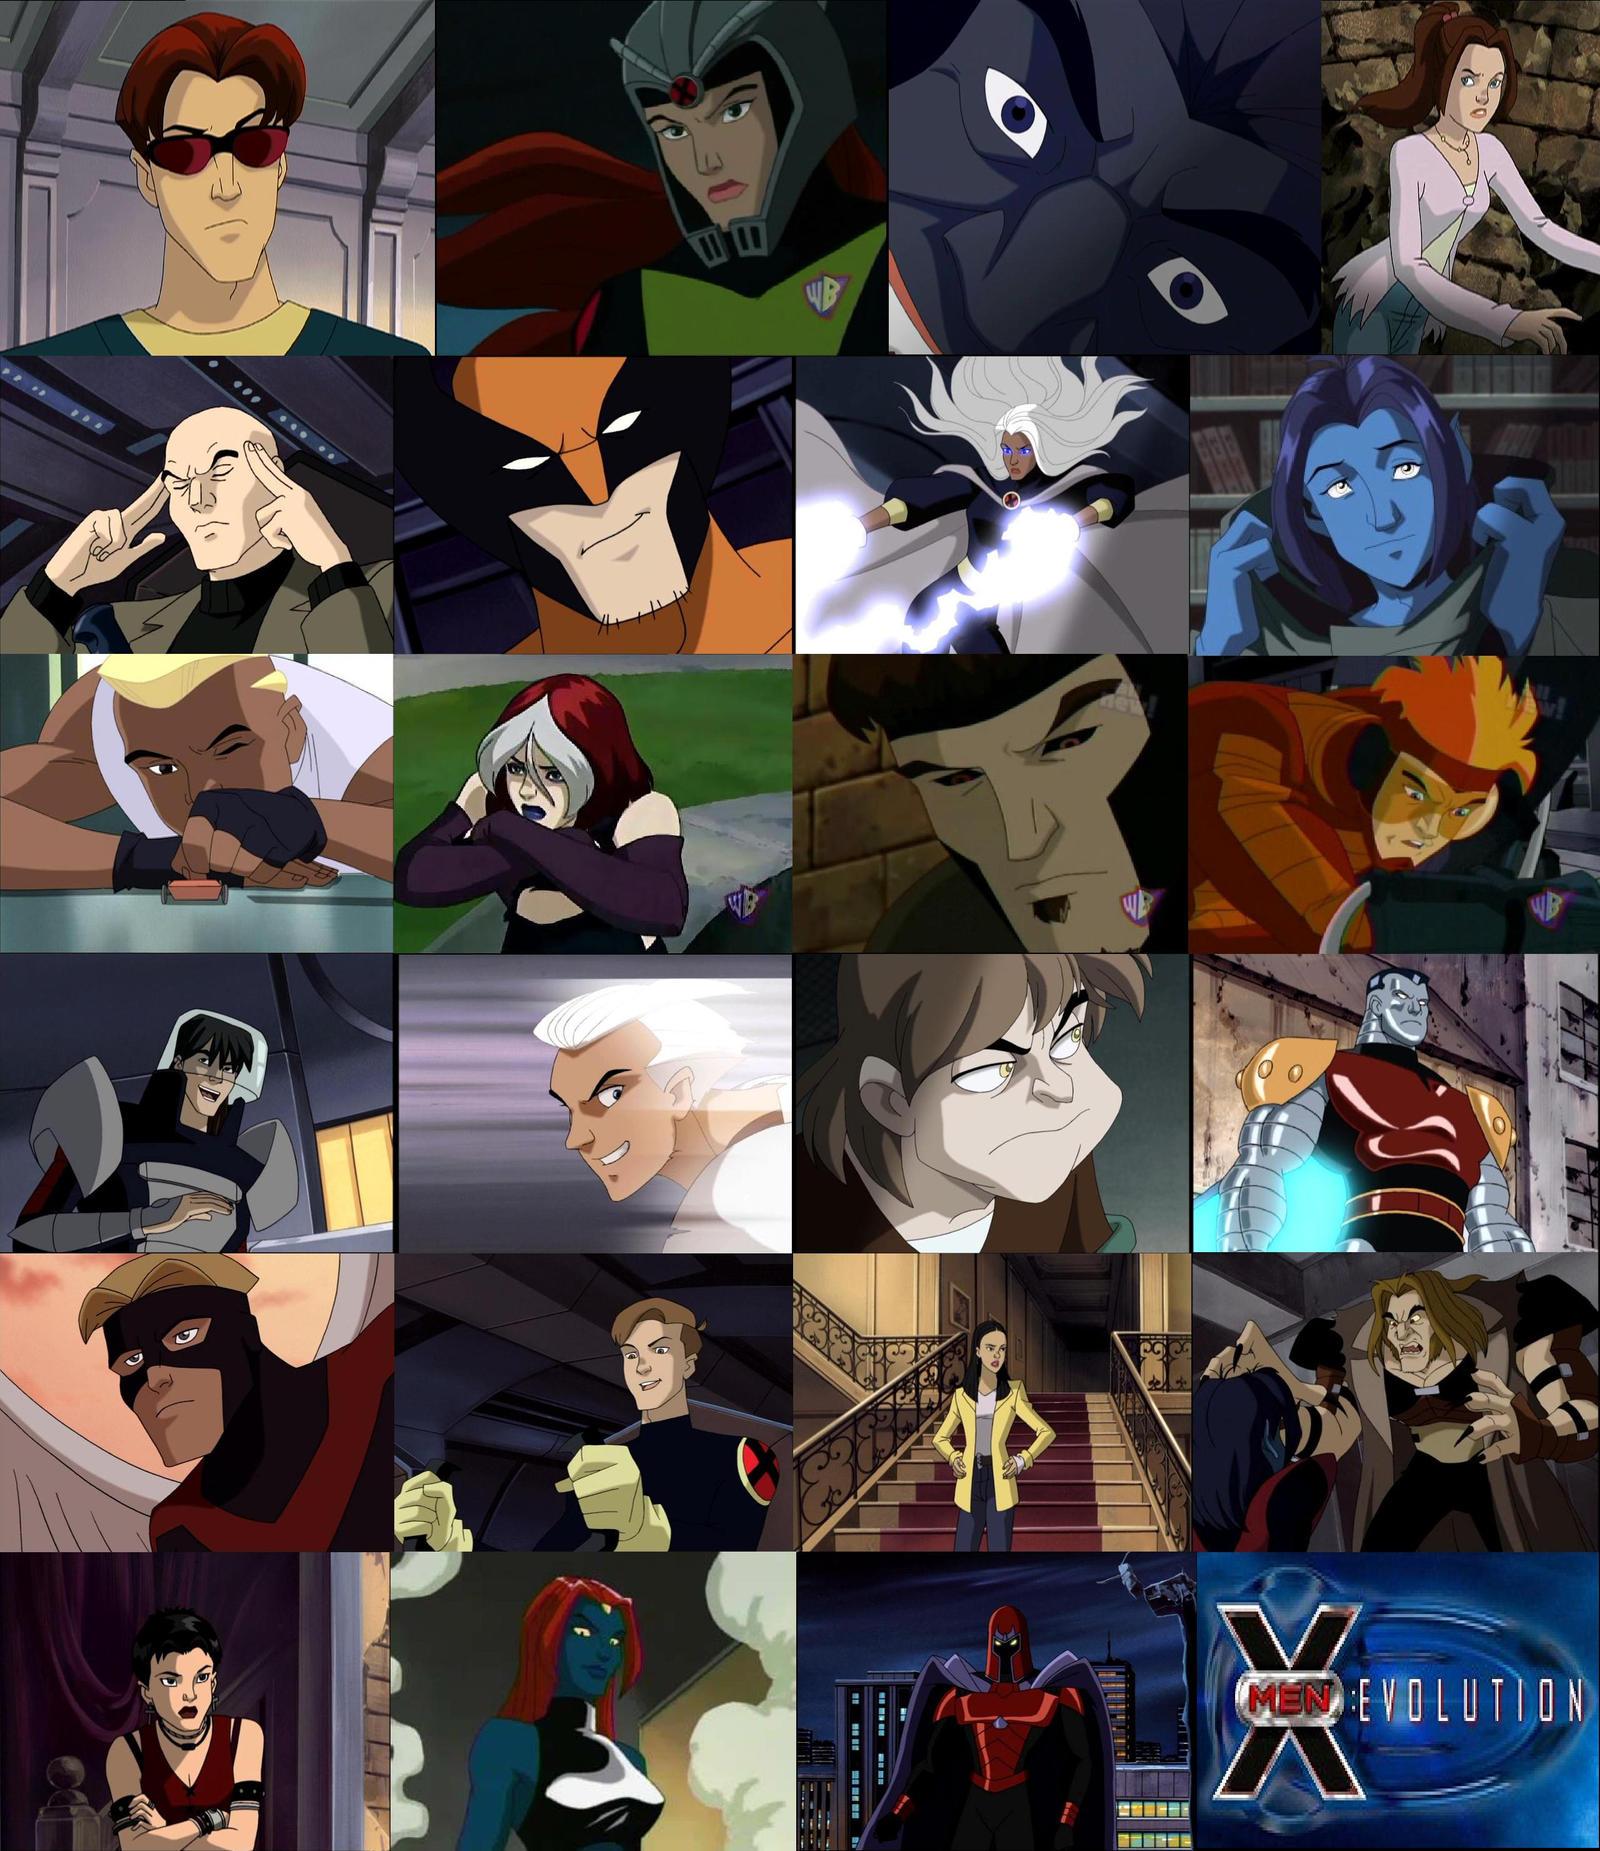 X-Men Evolution characters by The-Rogue-Whisper on DeviantArtX Men Evolution Villains